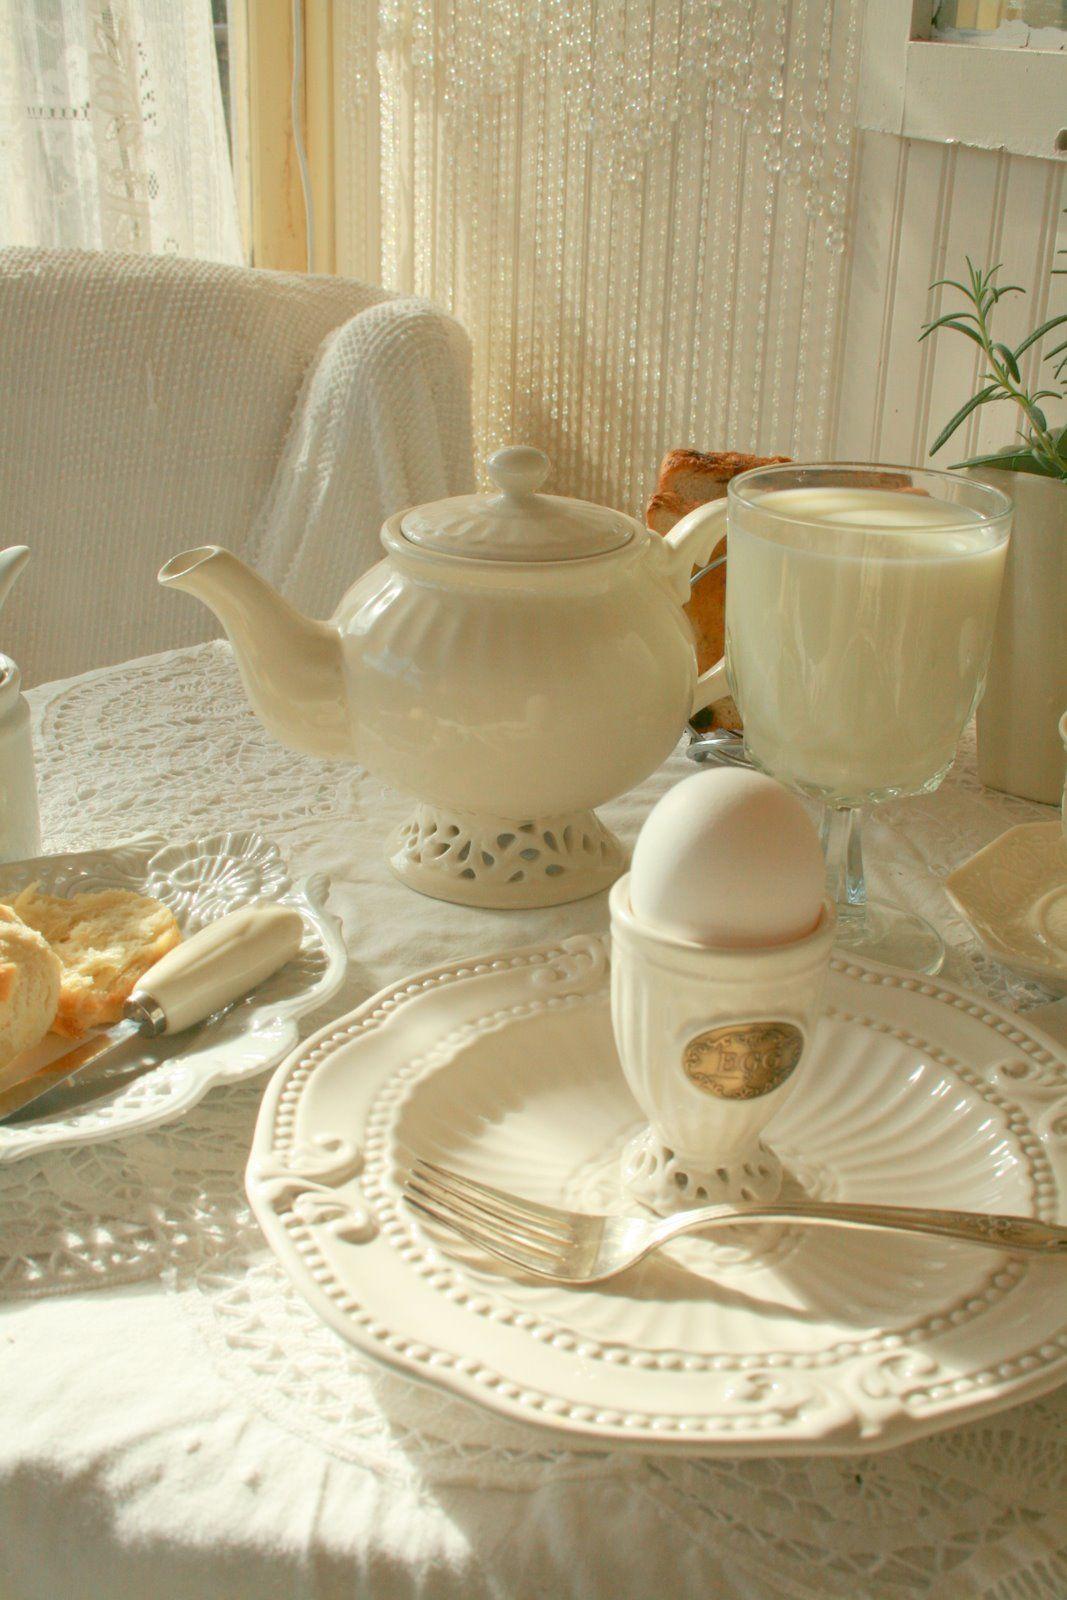 White breakfast